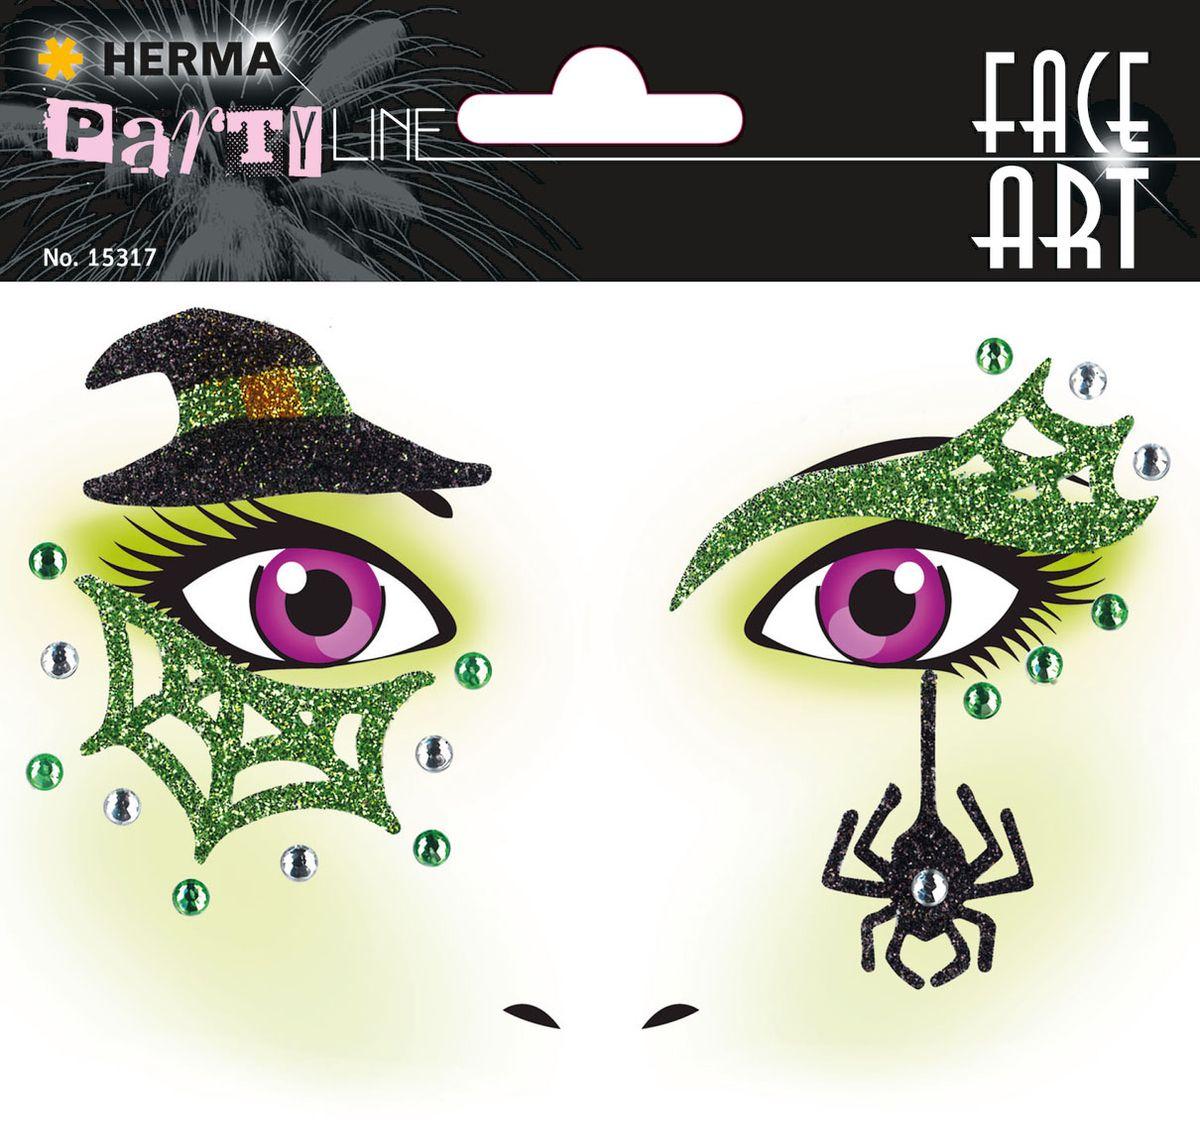 Herma Наклейки на лицо Face Art Witch (Ведьмочка)